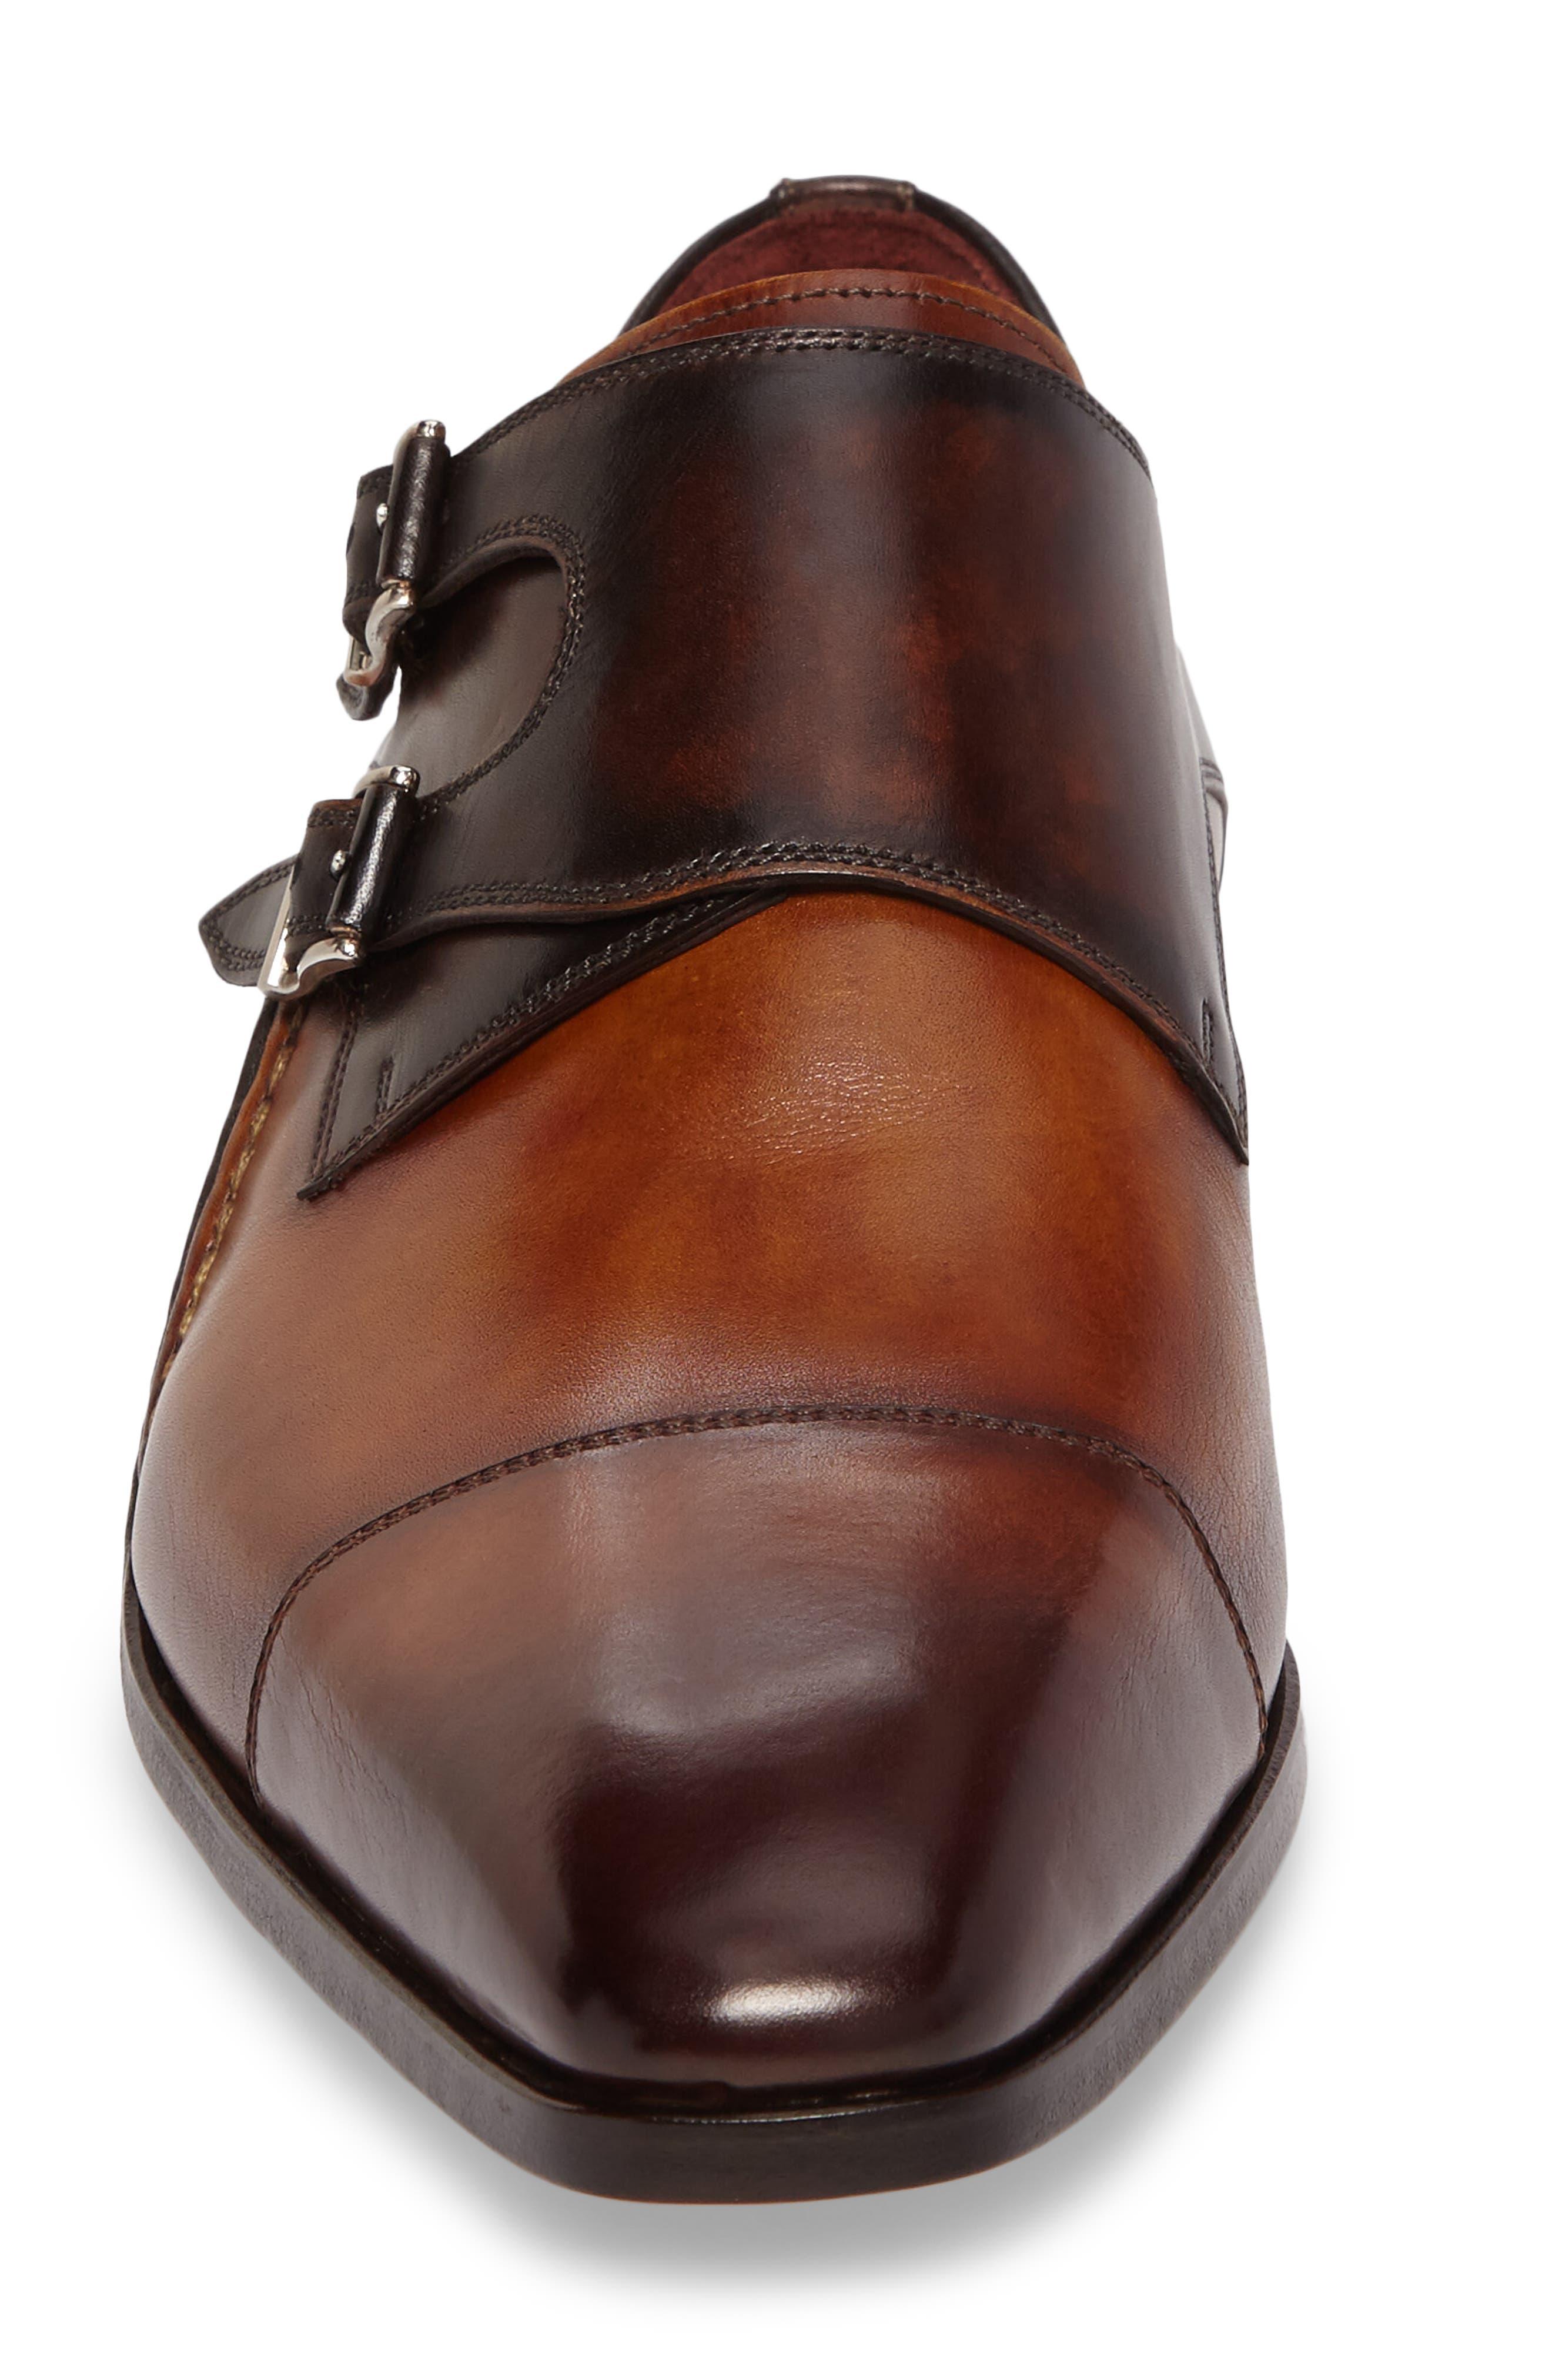 MAGNANNI, Ondara Double Monk Strap Shoe, Alternate thumbnail 4, color, CUERO/ BROWN LEATHER